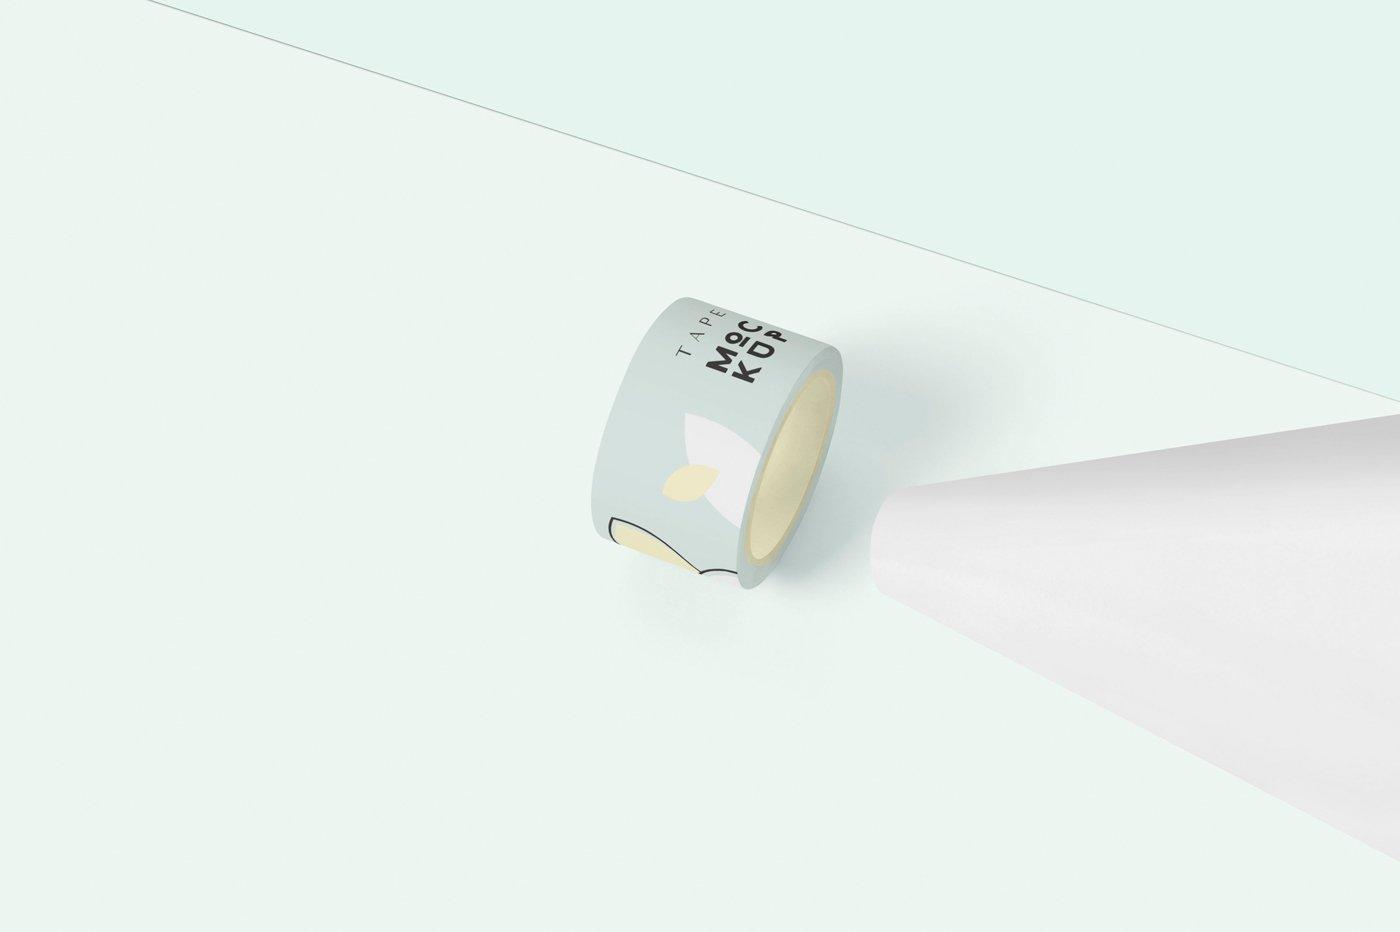 管状胶带设计展示样机模板 Small Packaging Tape Mockups插图(1)